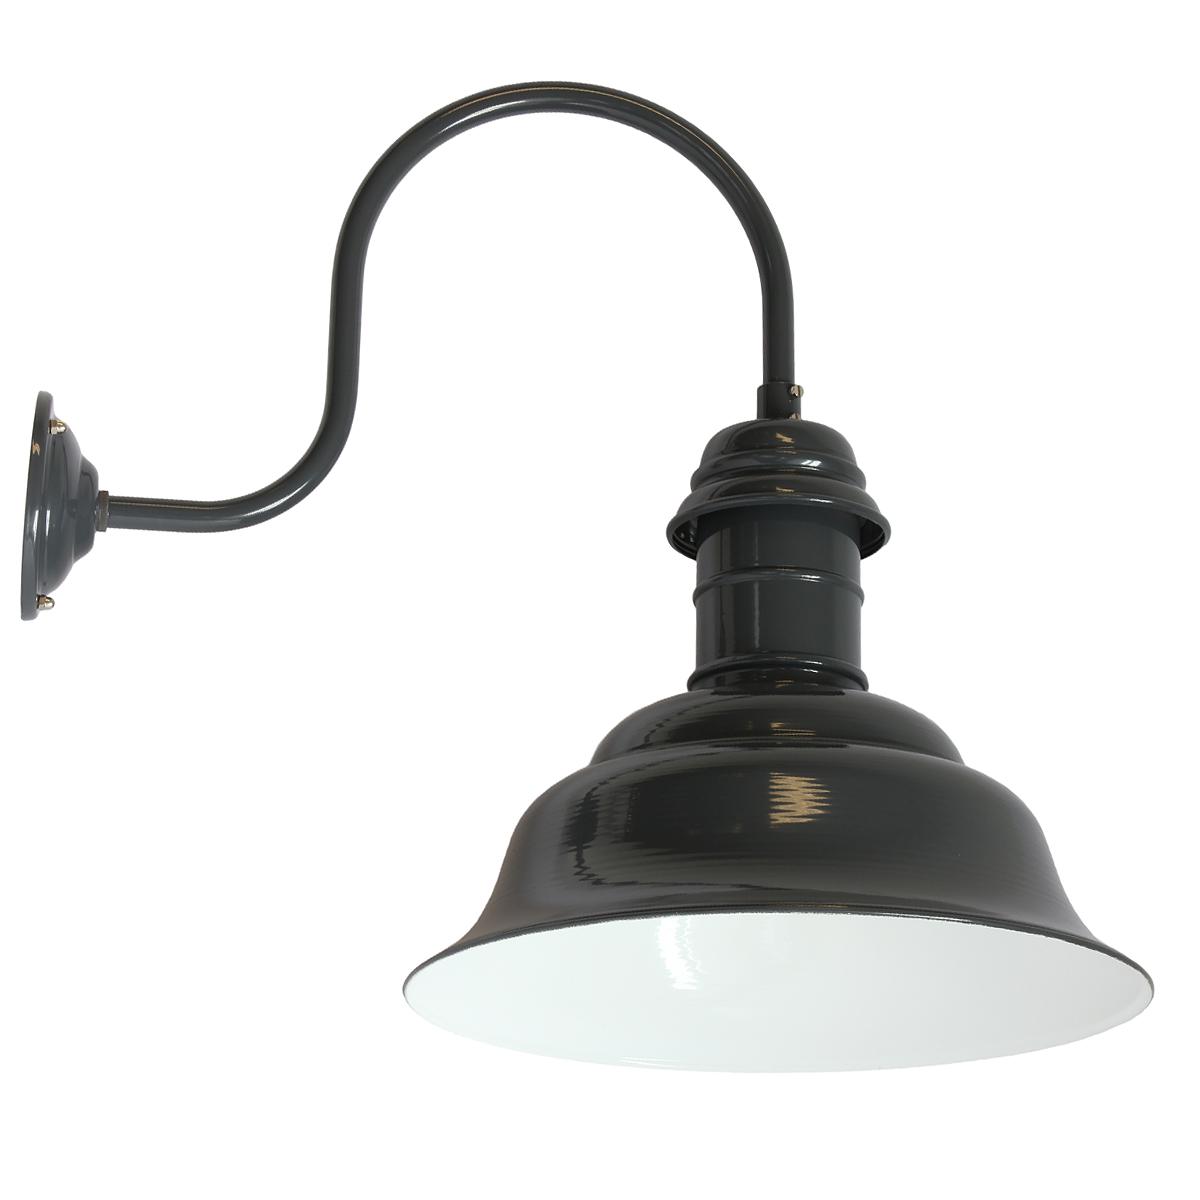 Industriedesign wandleuchte dortmund ro 130 terra lumi - Wandlampe industriedesign ...